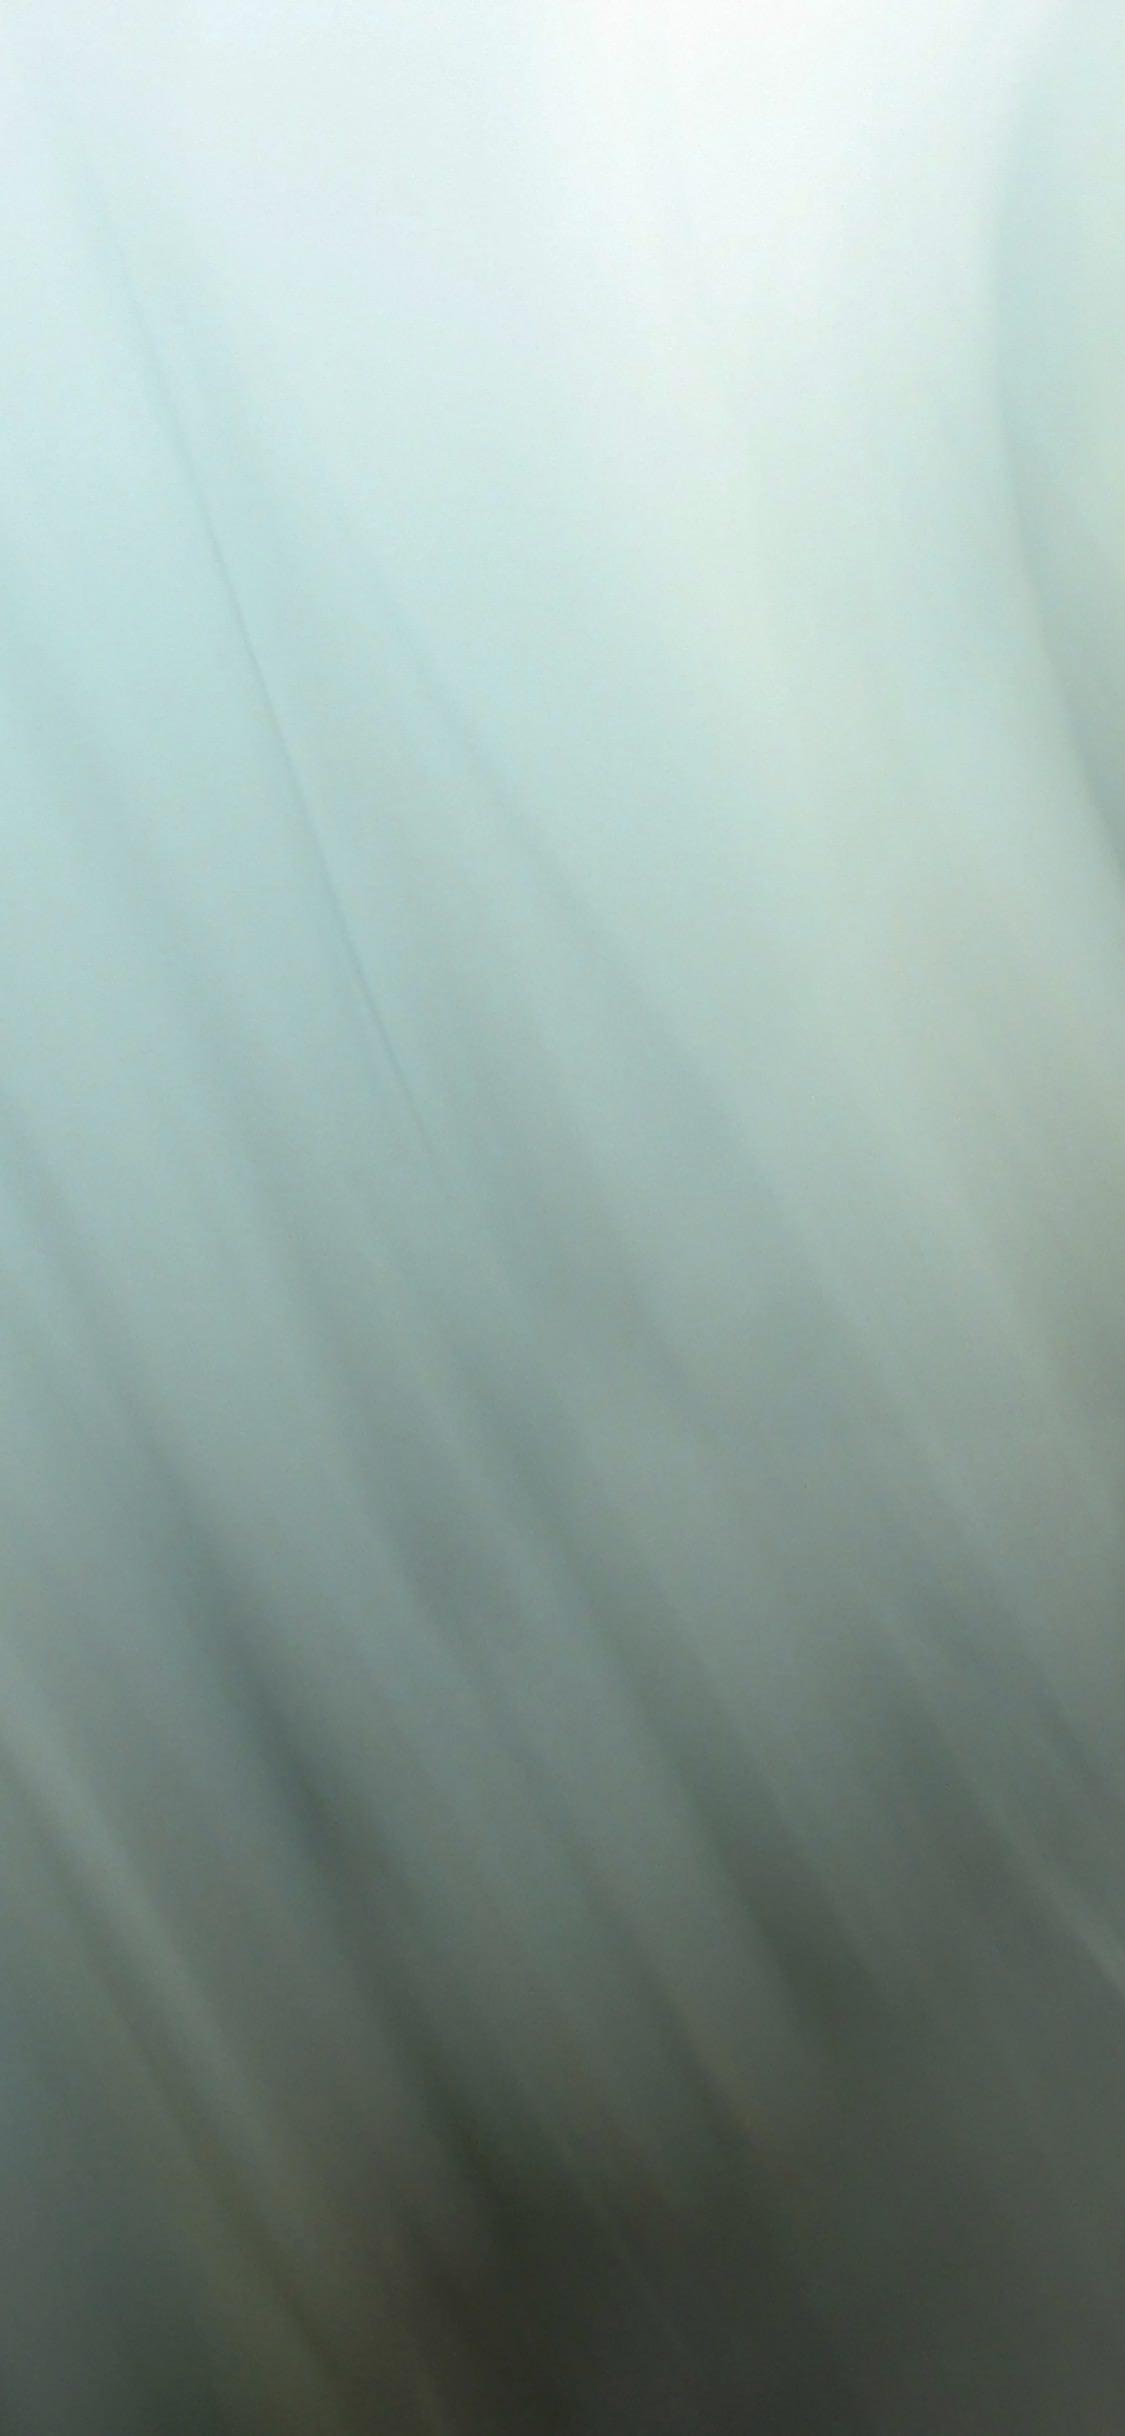 iPhone XS , iPhone X 壁紙 wallpaper 0492